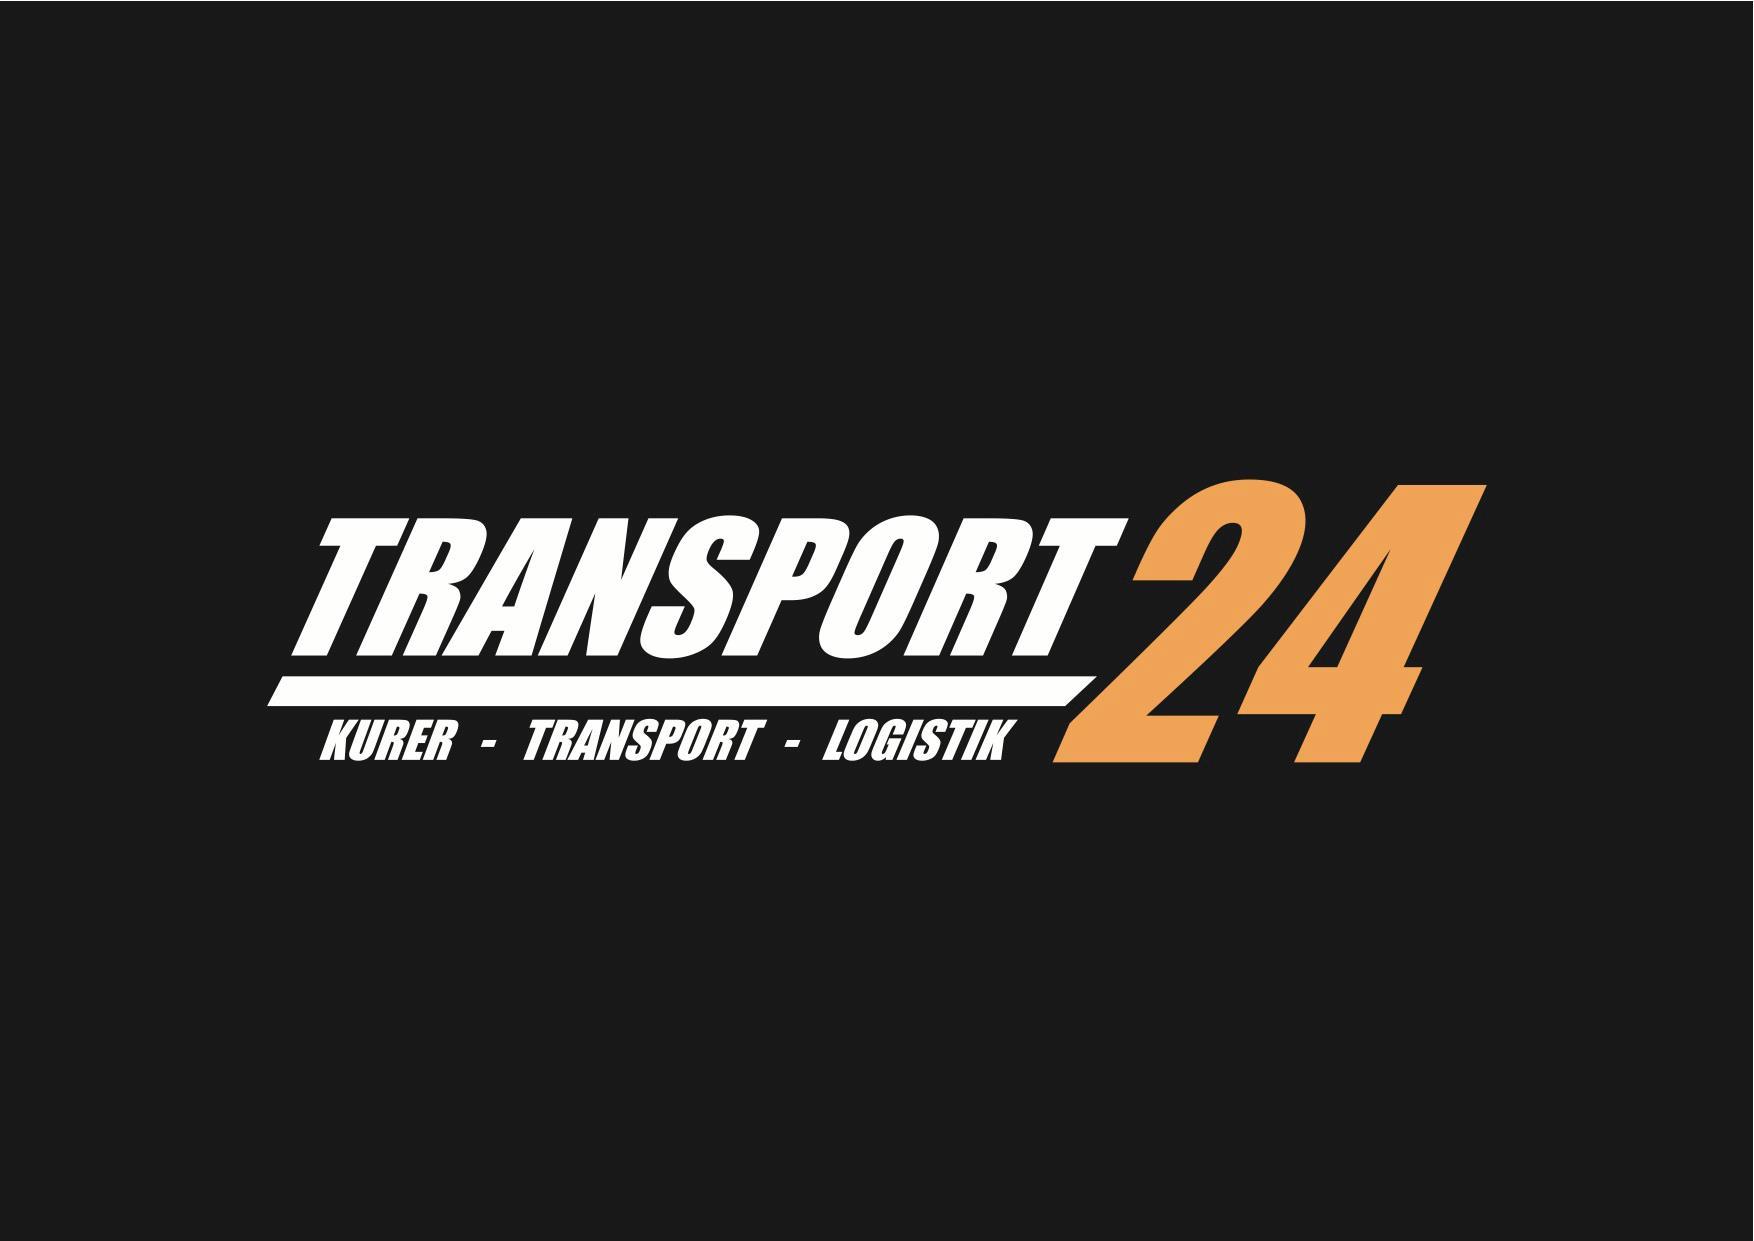 Transport24